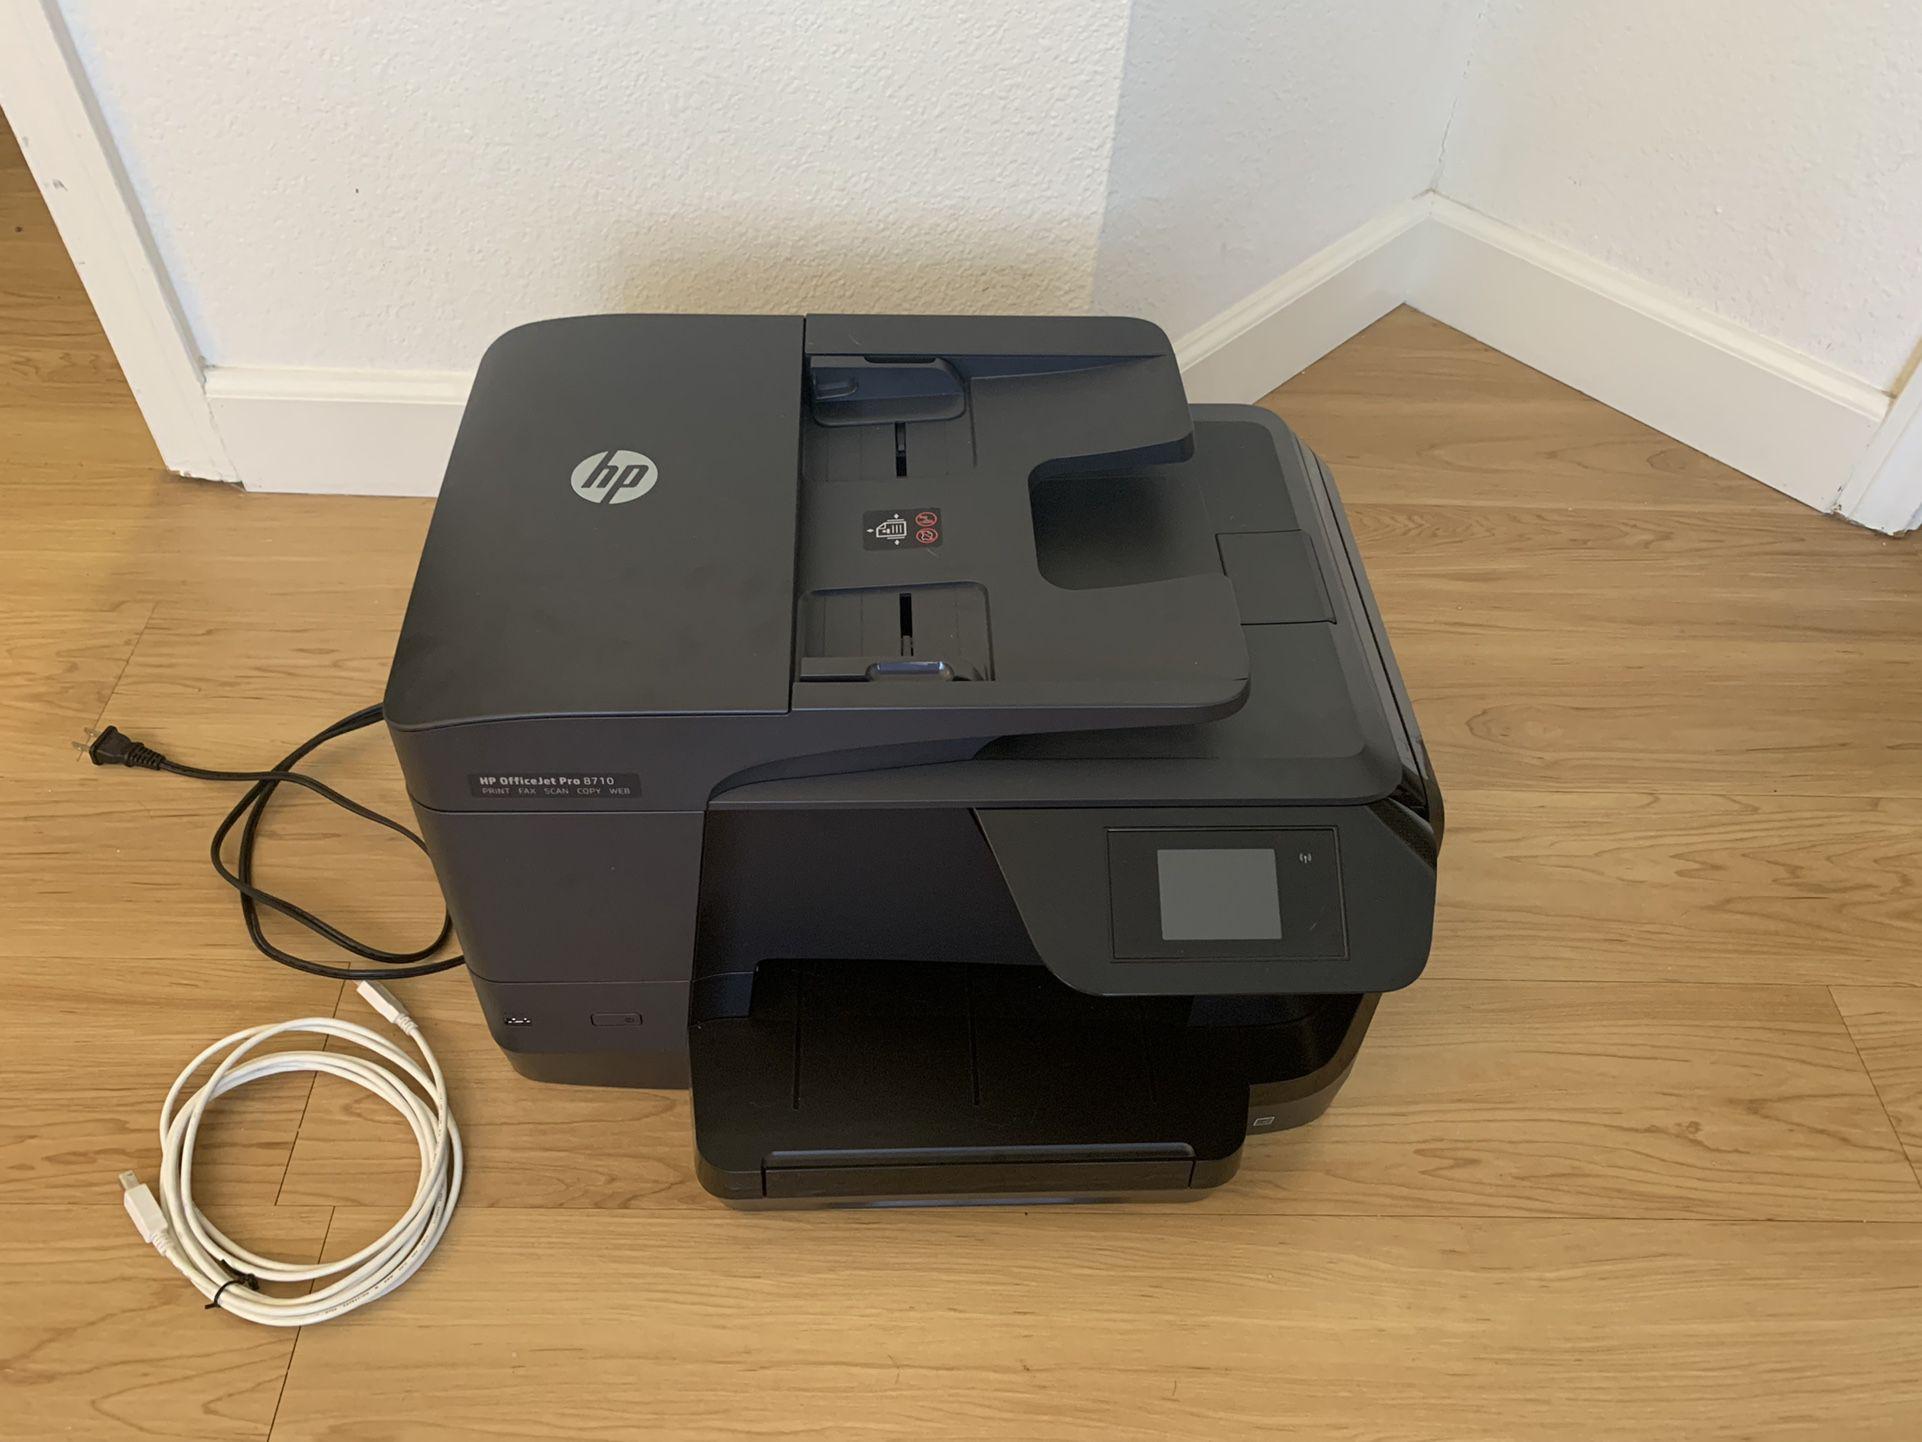 HP Office Jet Pro 8710